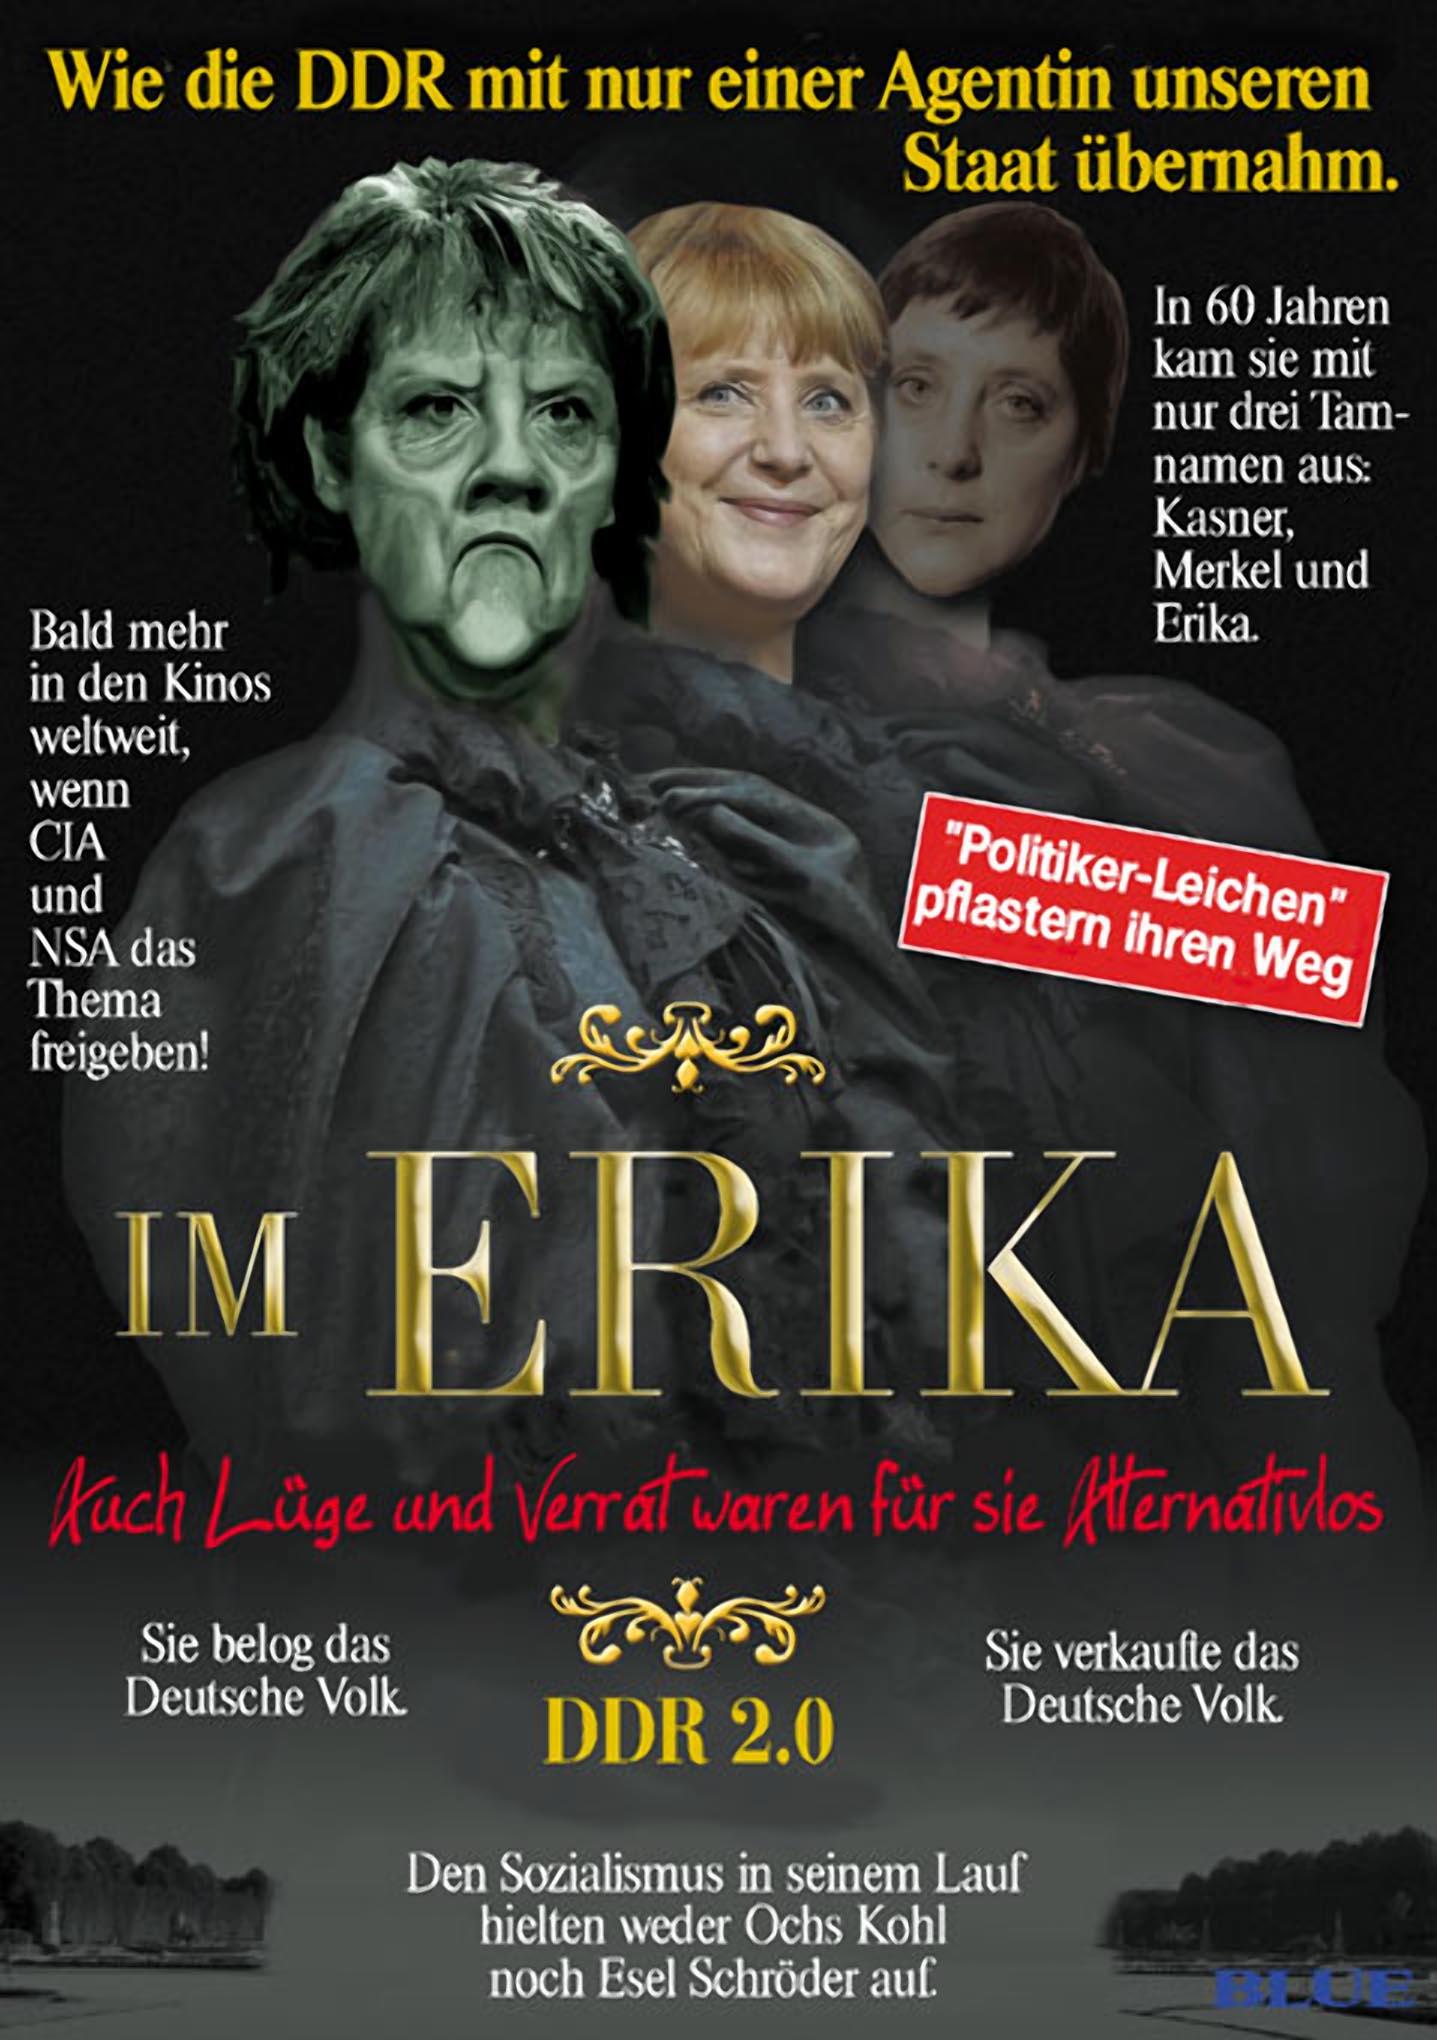 Erika Merkel